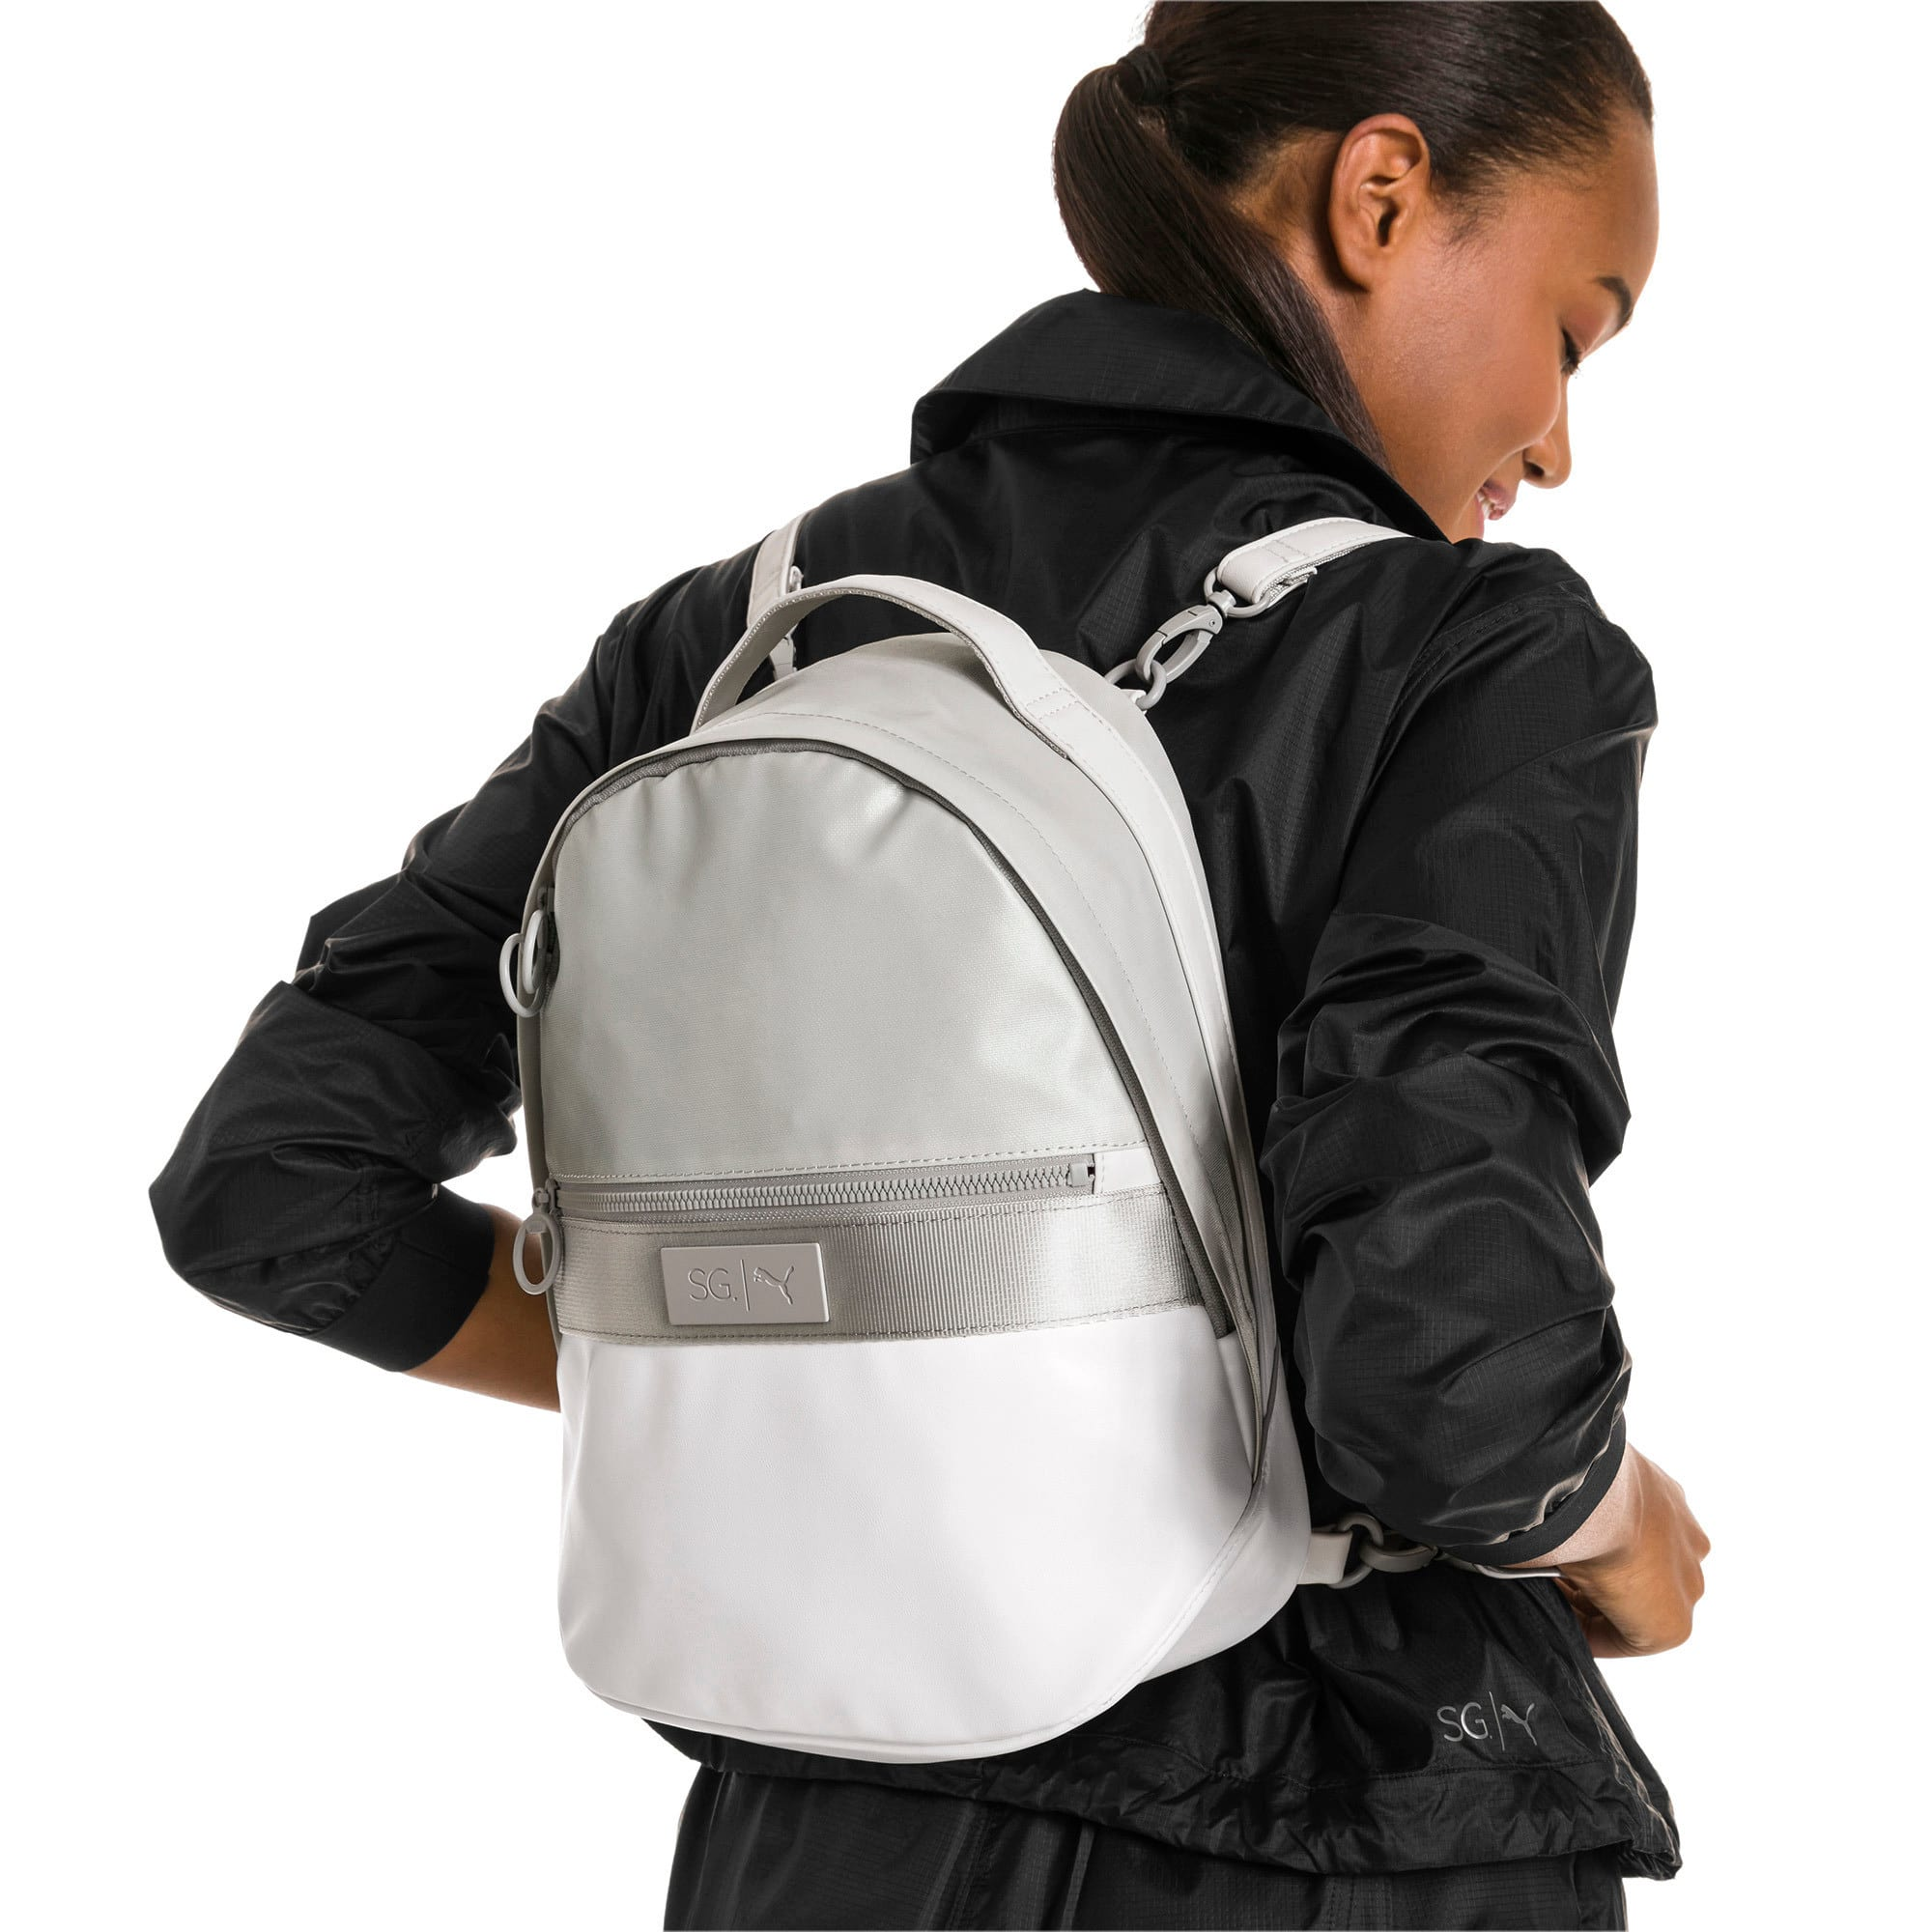 Thumbnail 2 of SG x PUMA Style Backpack, Puma White, medium